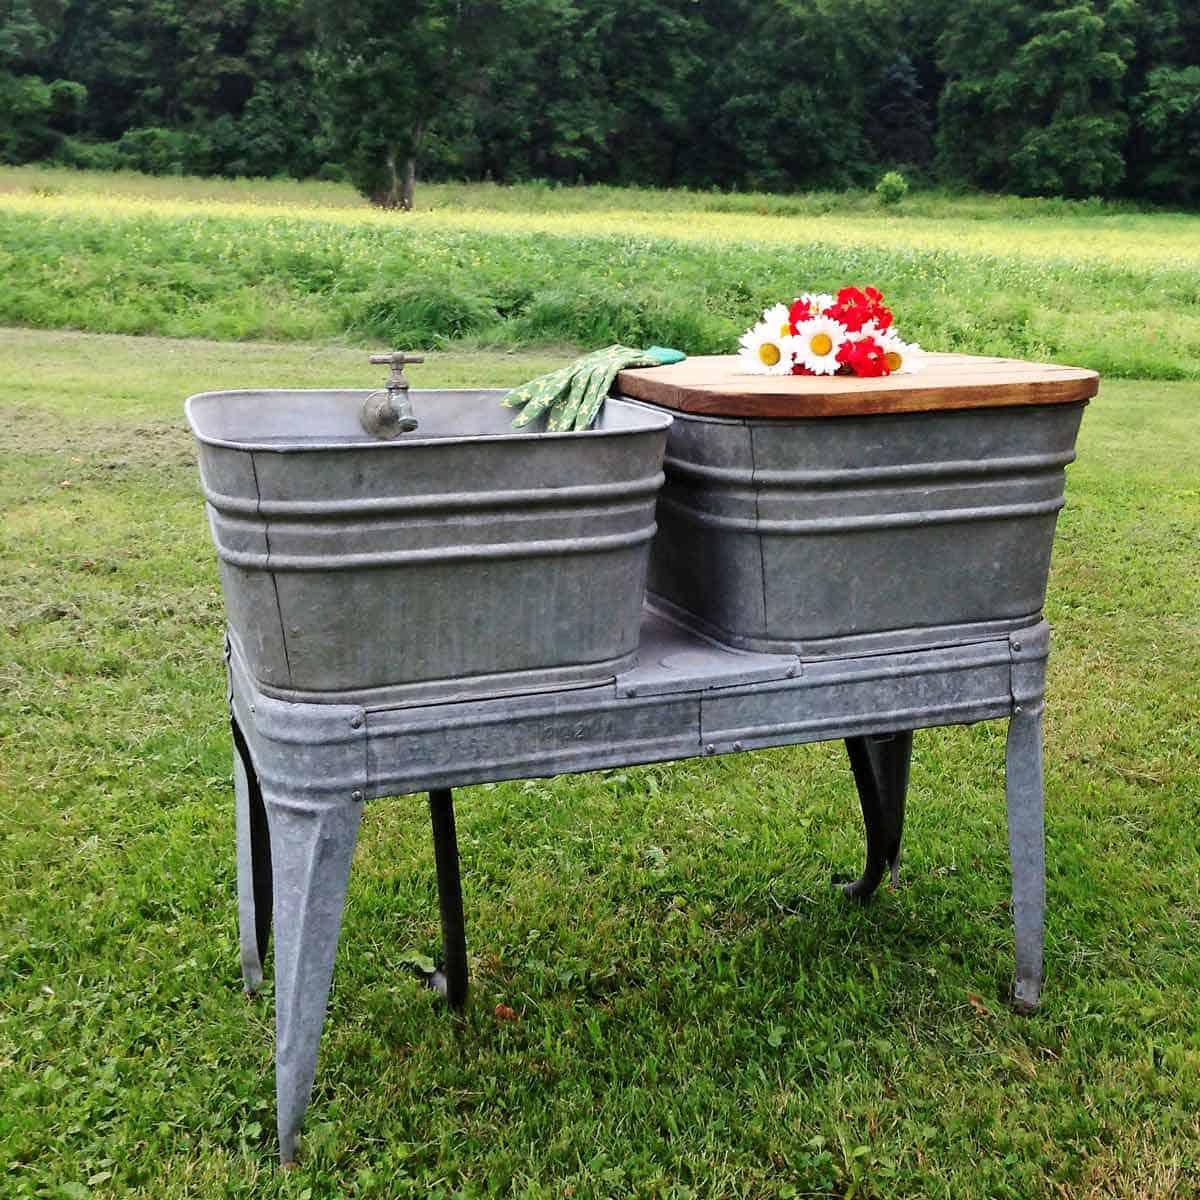 3.Simphome.com Rustic Galvanized Garden Sink